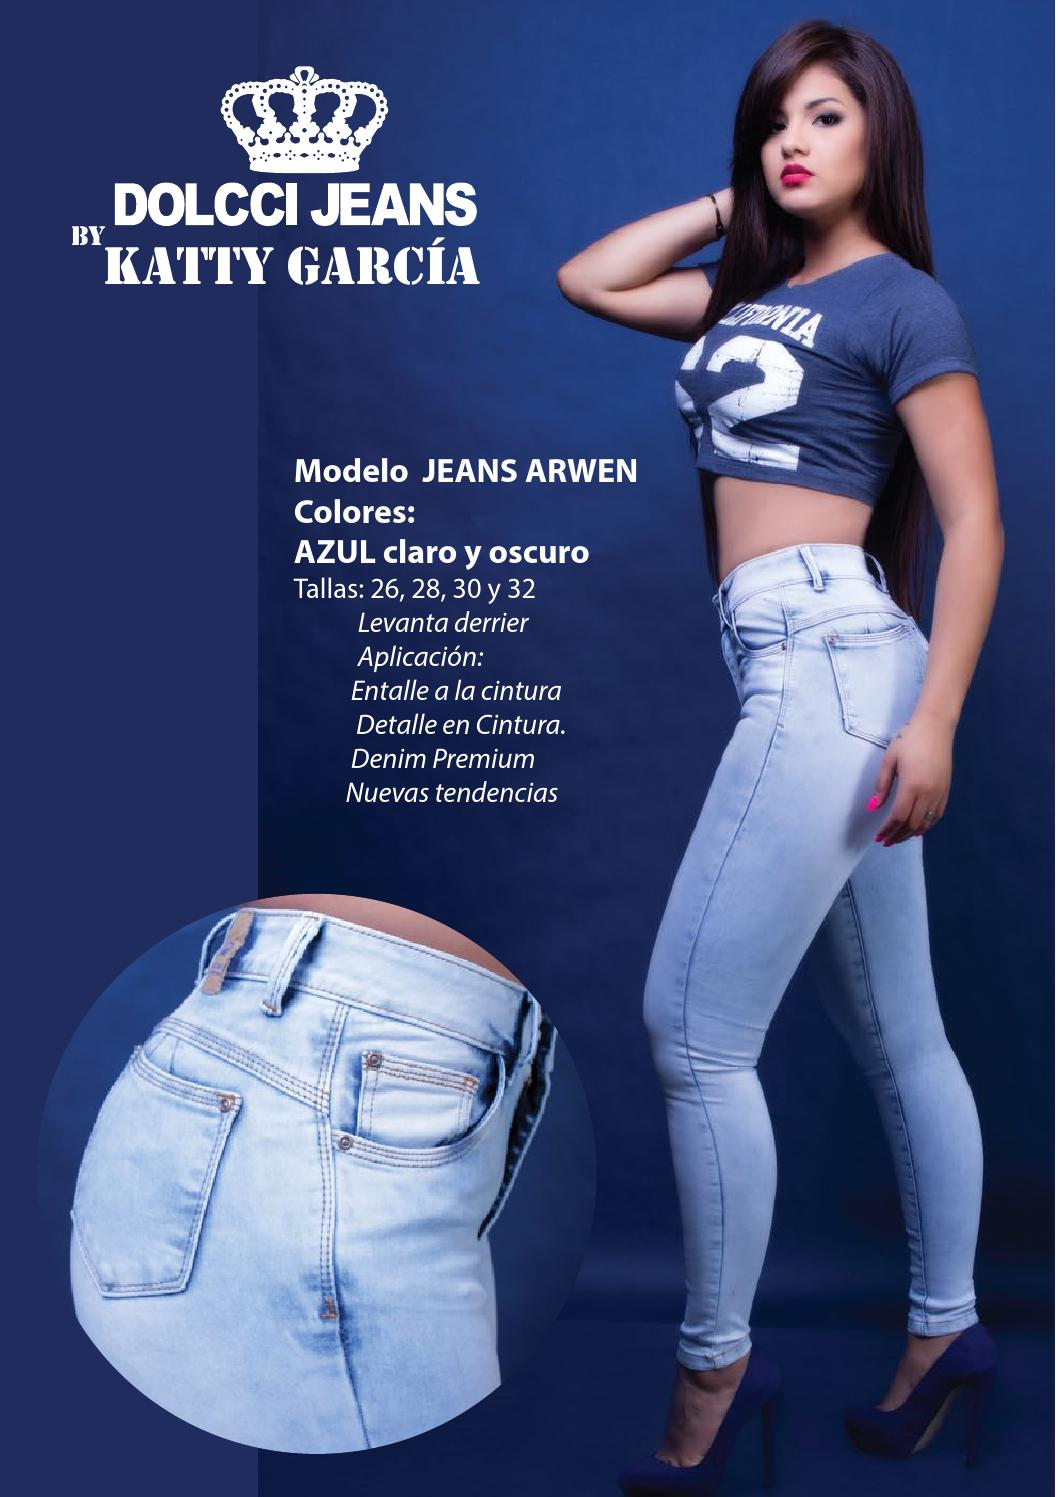 Nueva Colecciu00f3n Verano 2016 by Dolcci Jeans by Katty Garcia (page 3) - issuu